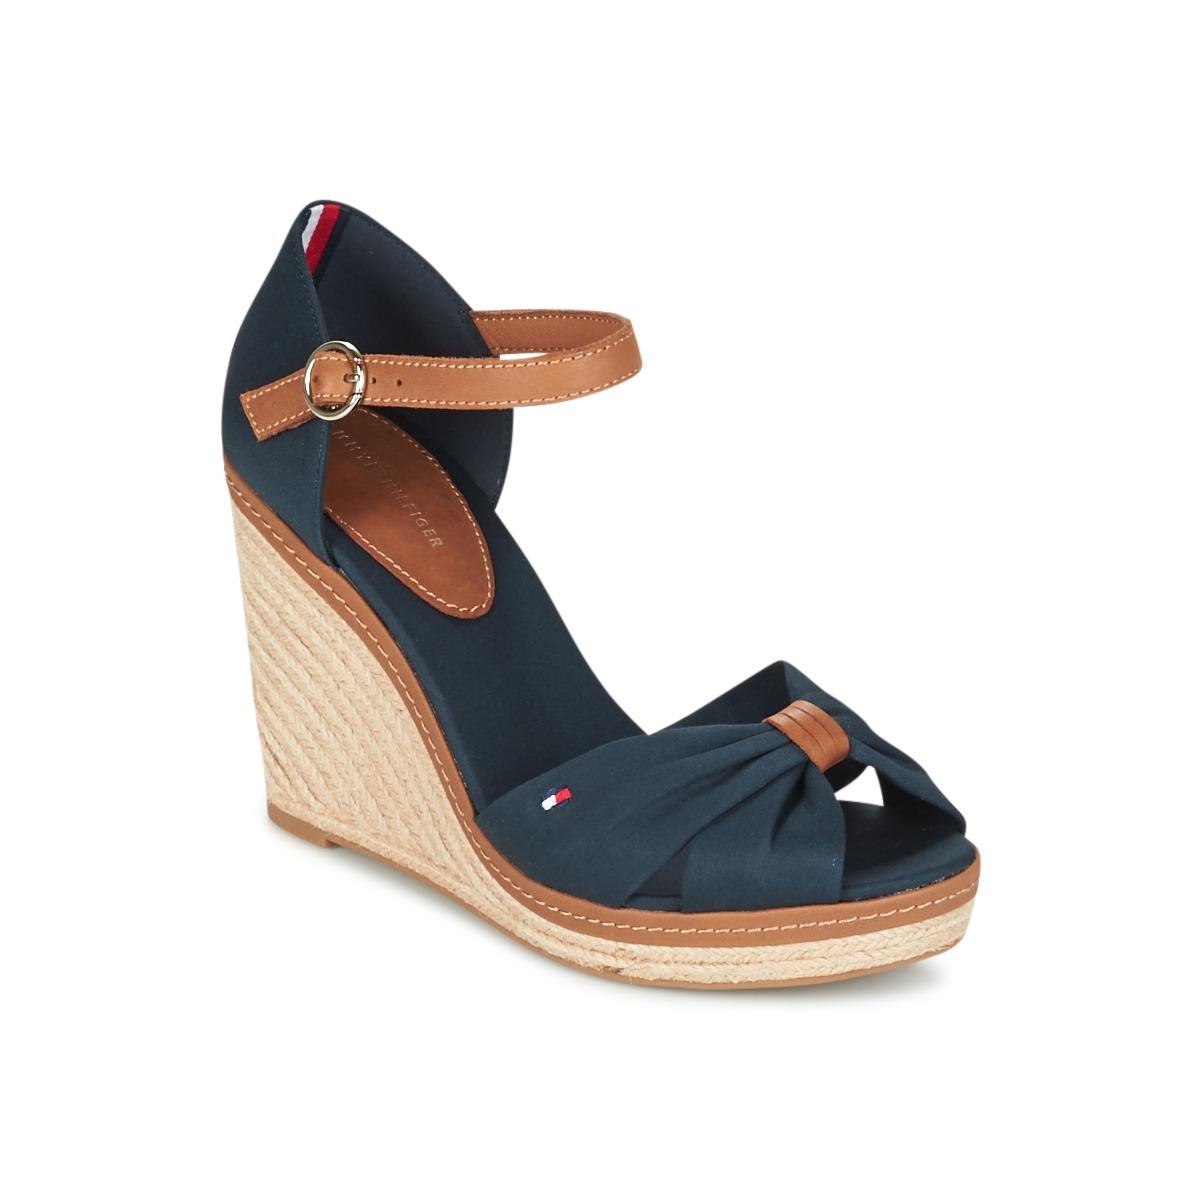 Chaussures Tommy Hilfiger roses Casual femme bgUGj